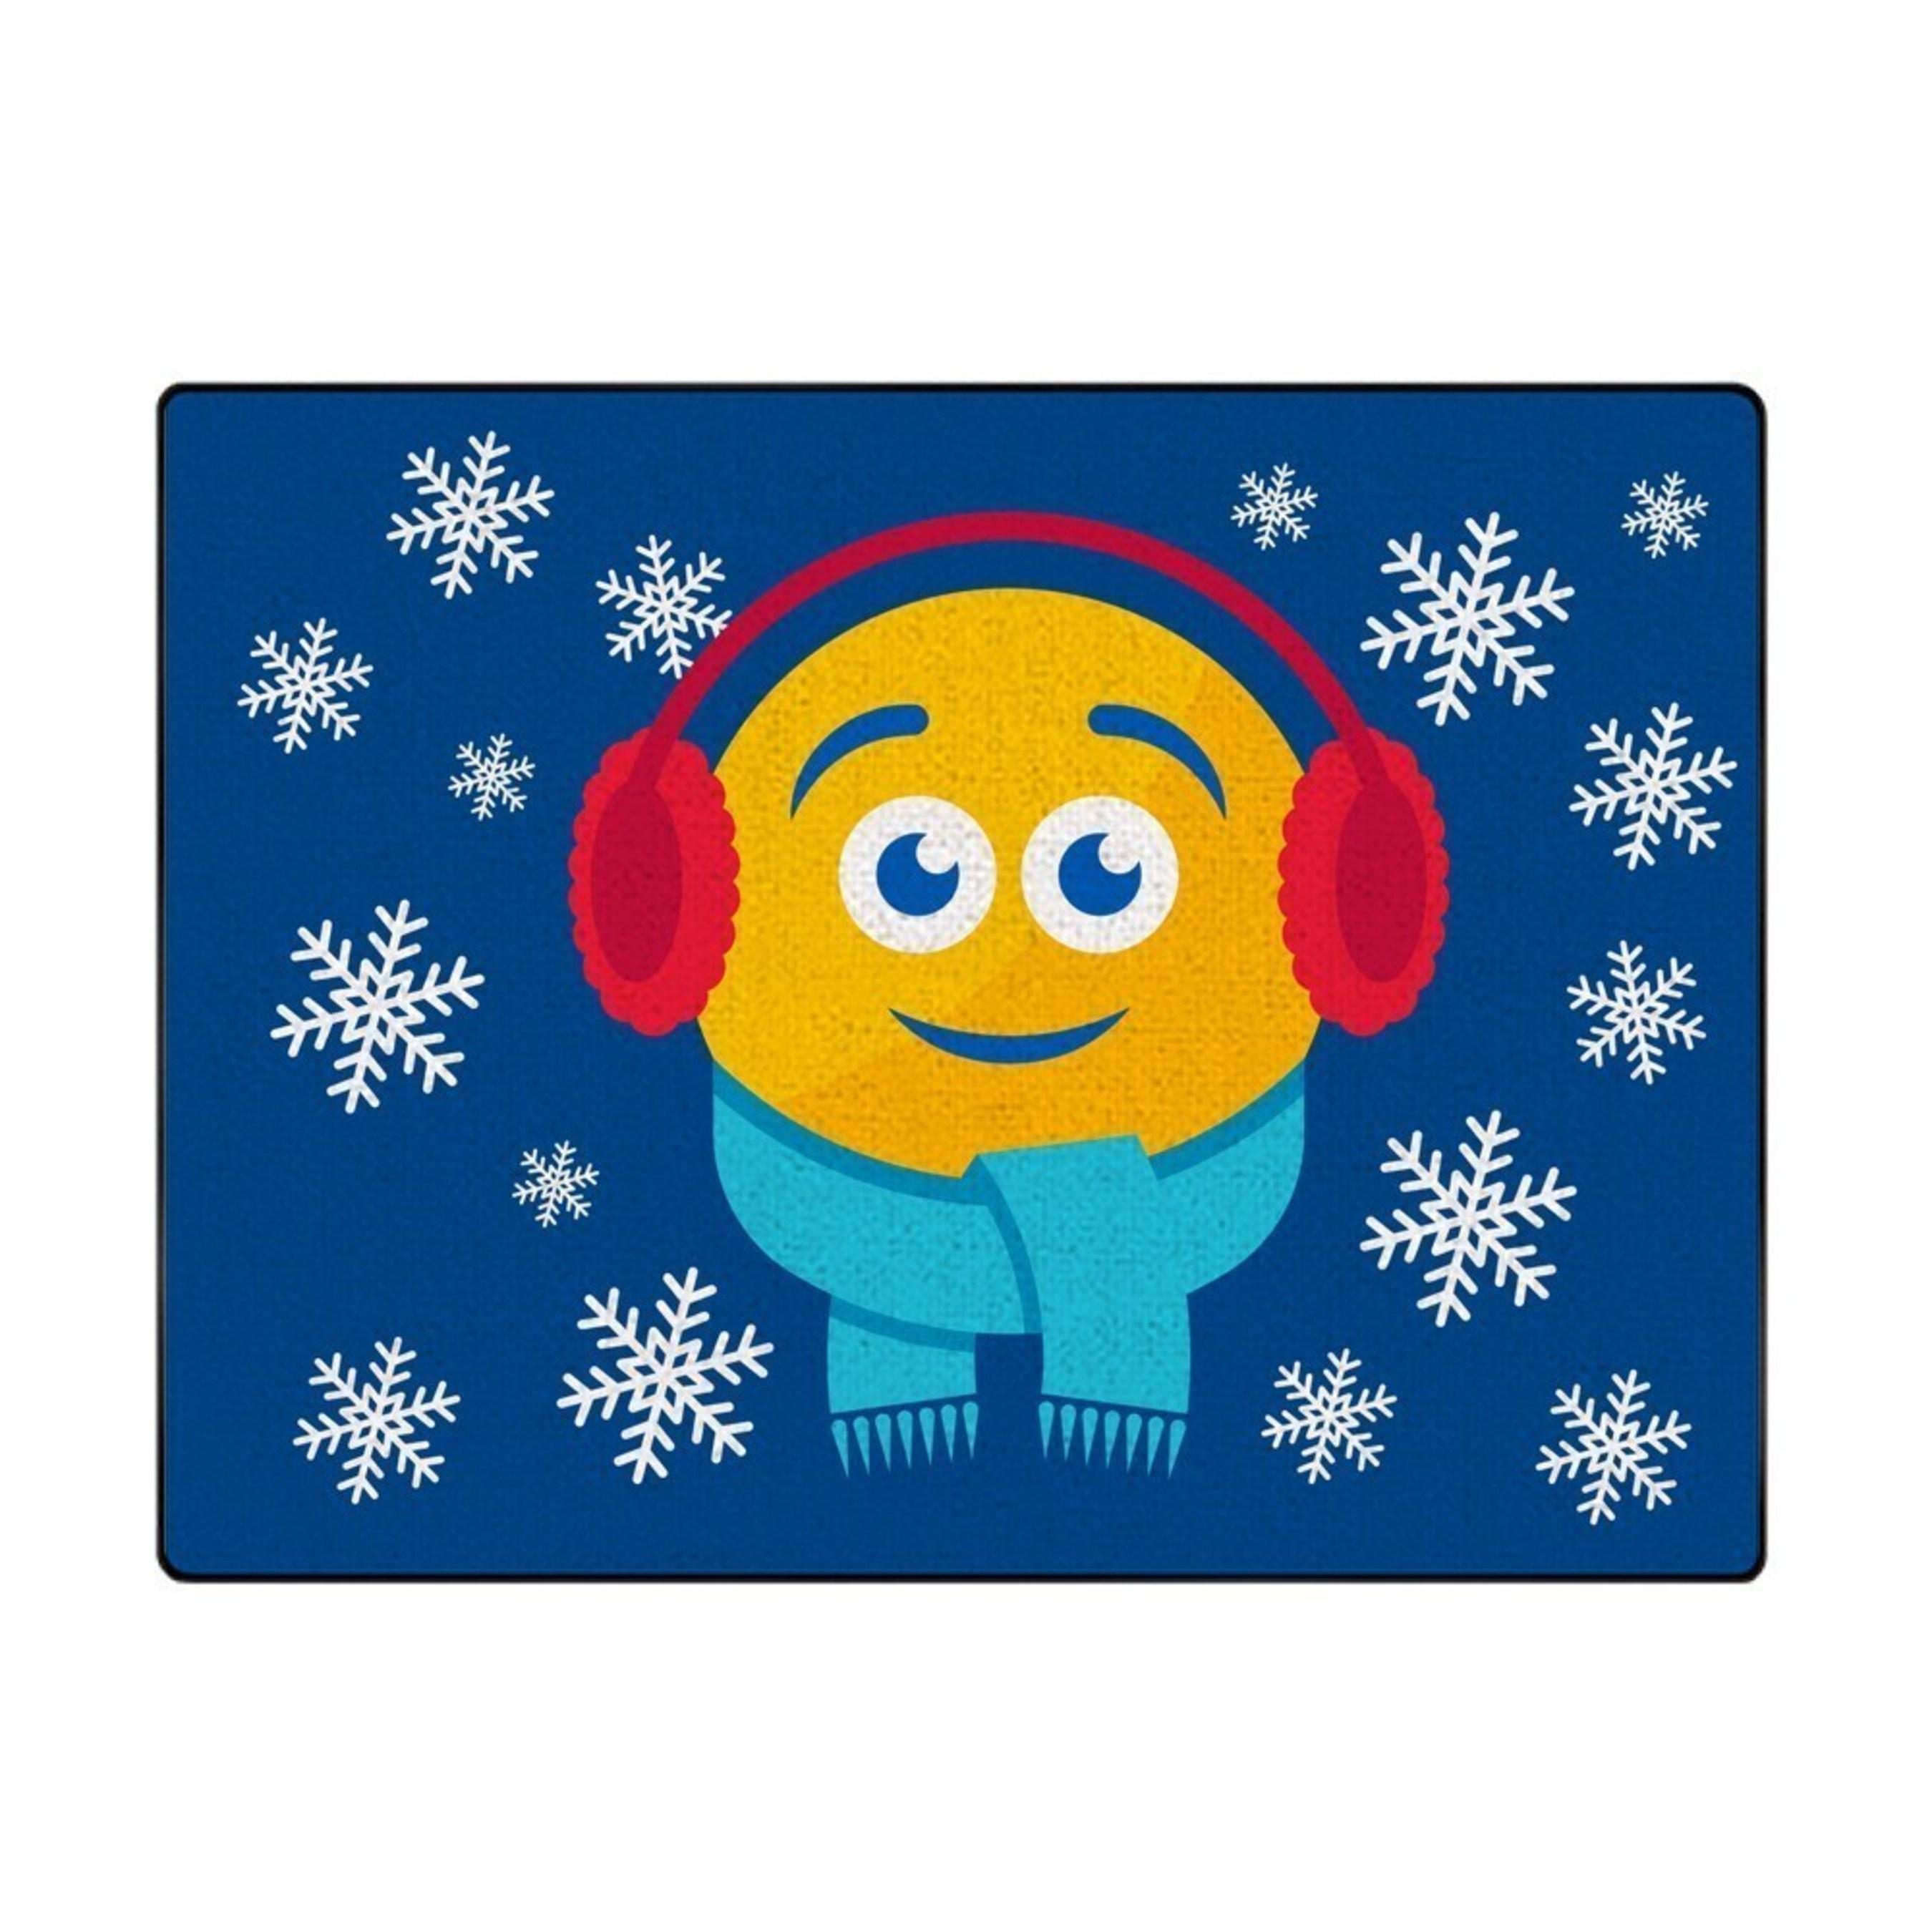 PepsiMoji Holiday collection doormat